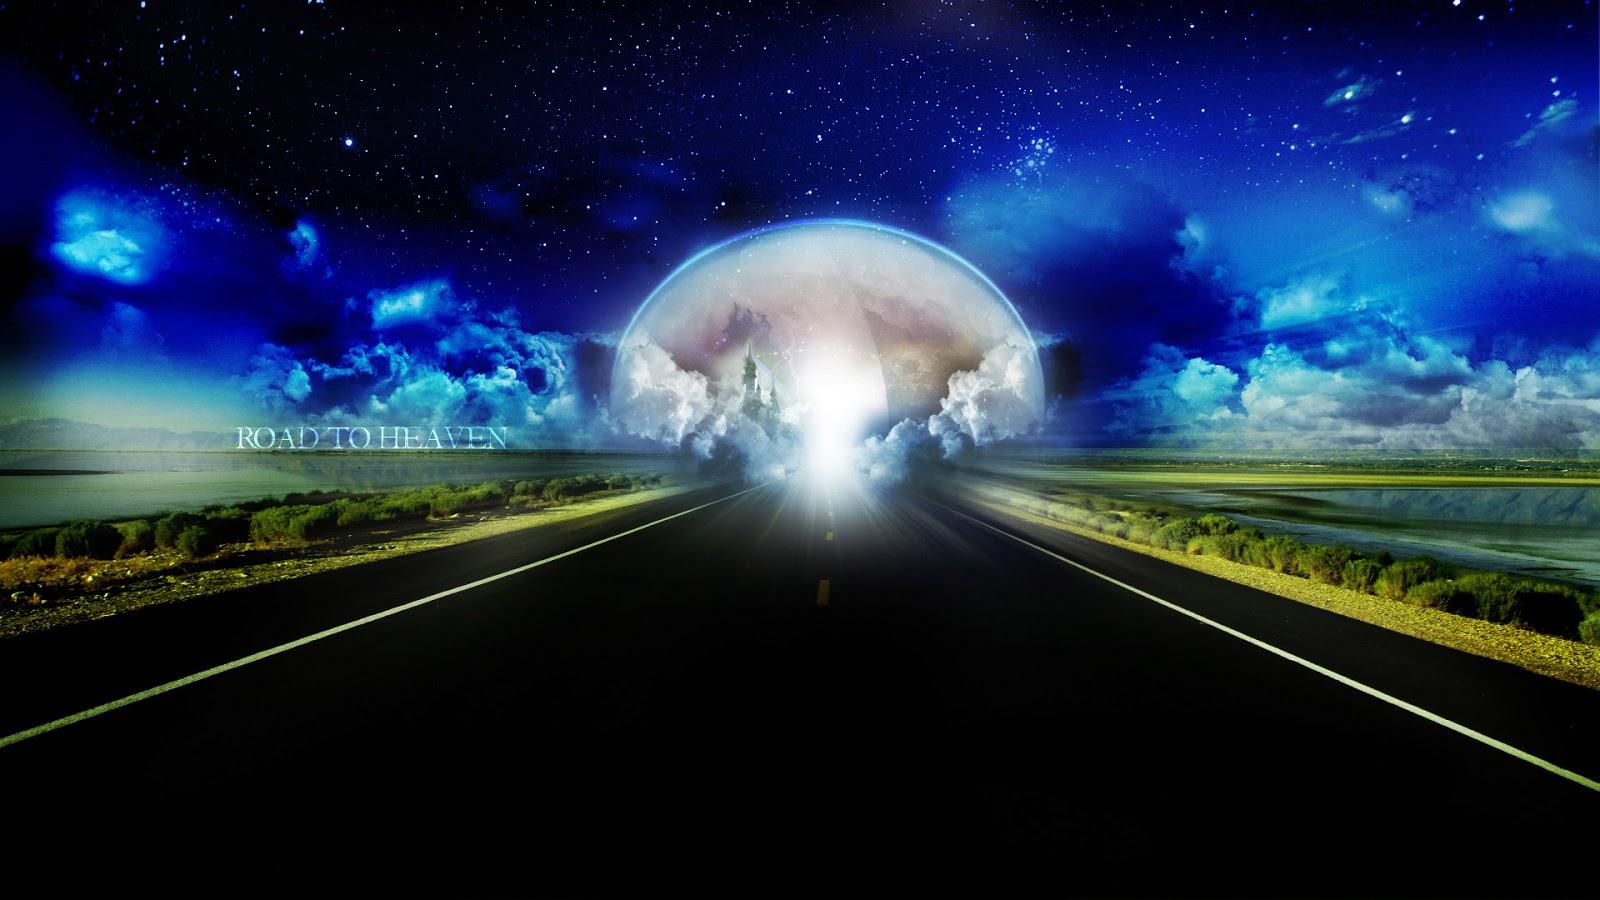 http://1.bp.blogspot.com/-PBkw2-8zpk4/UOMmiG8x4rI/AAAAAAAABGQ/gnlUbcruPoo/s1600/road_to_heaven-HD.jpg